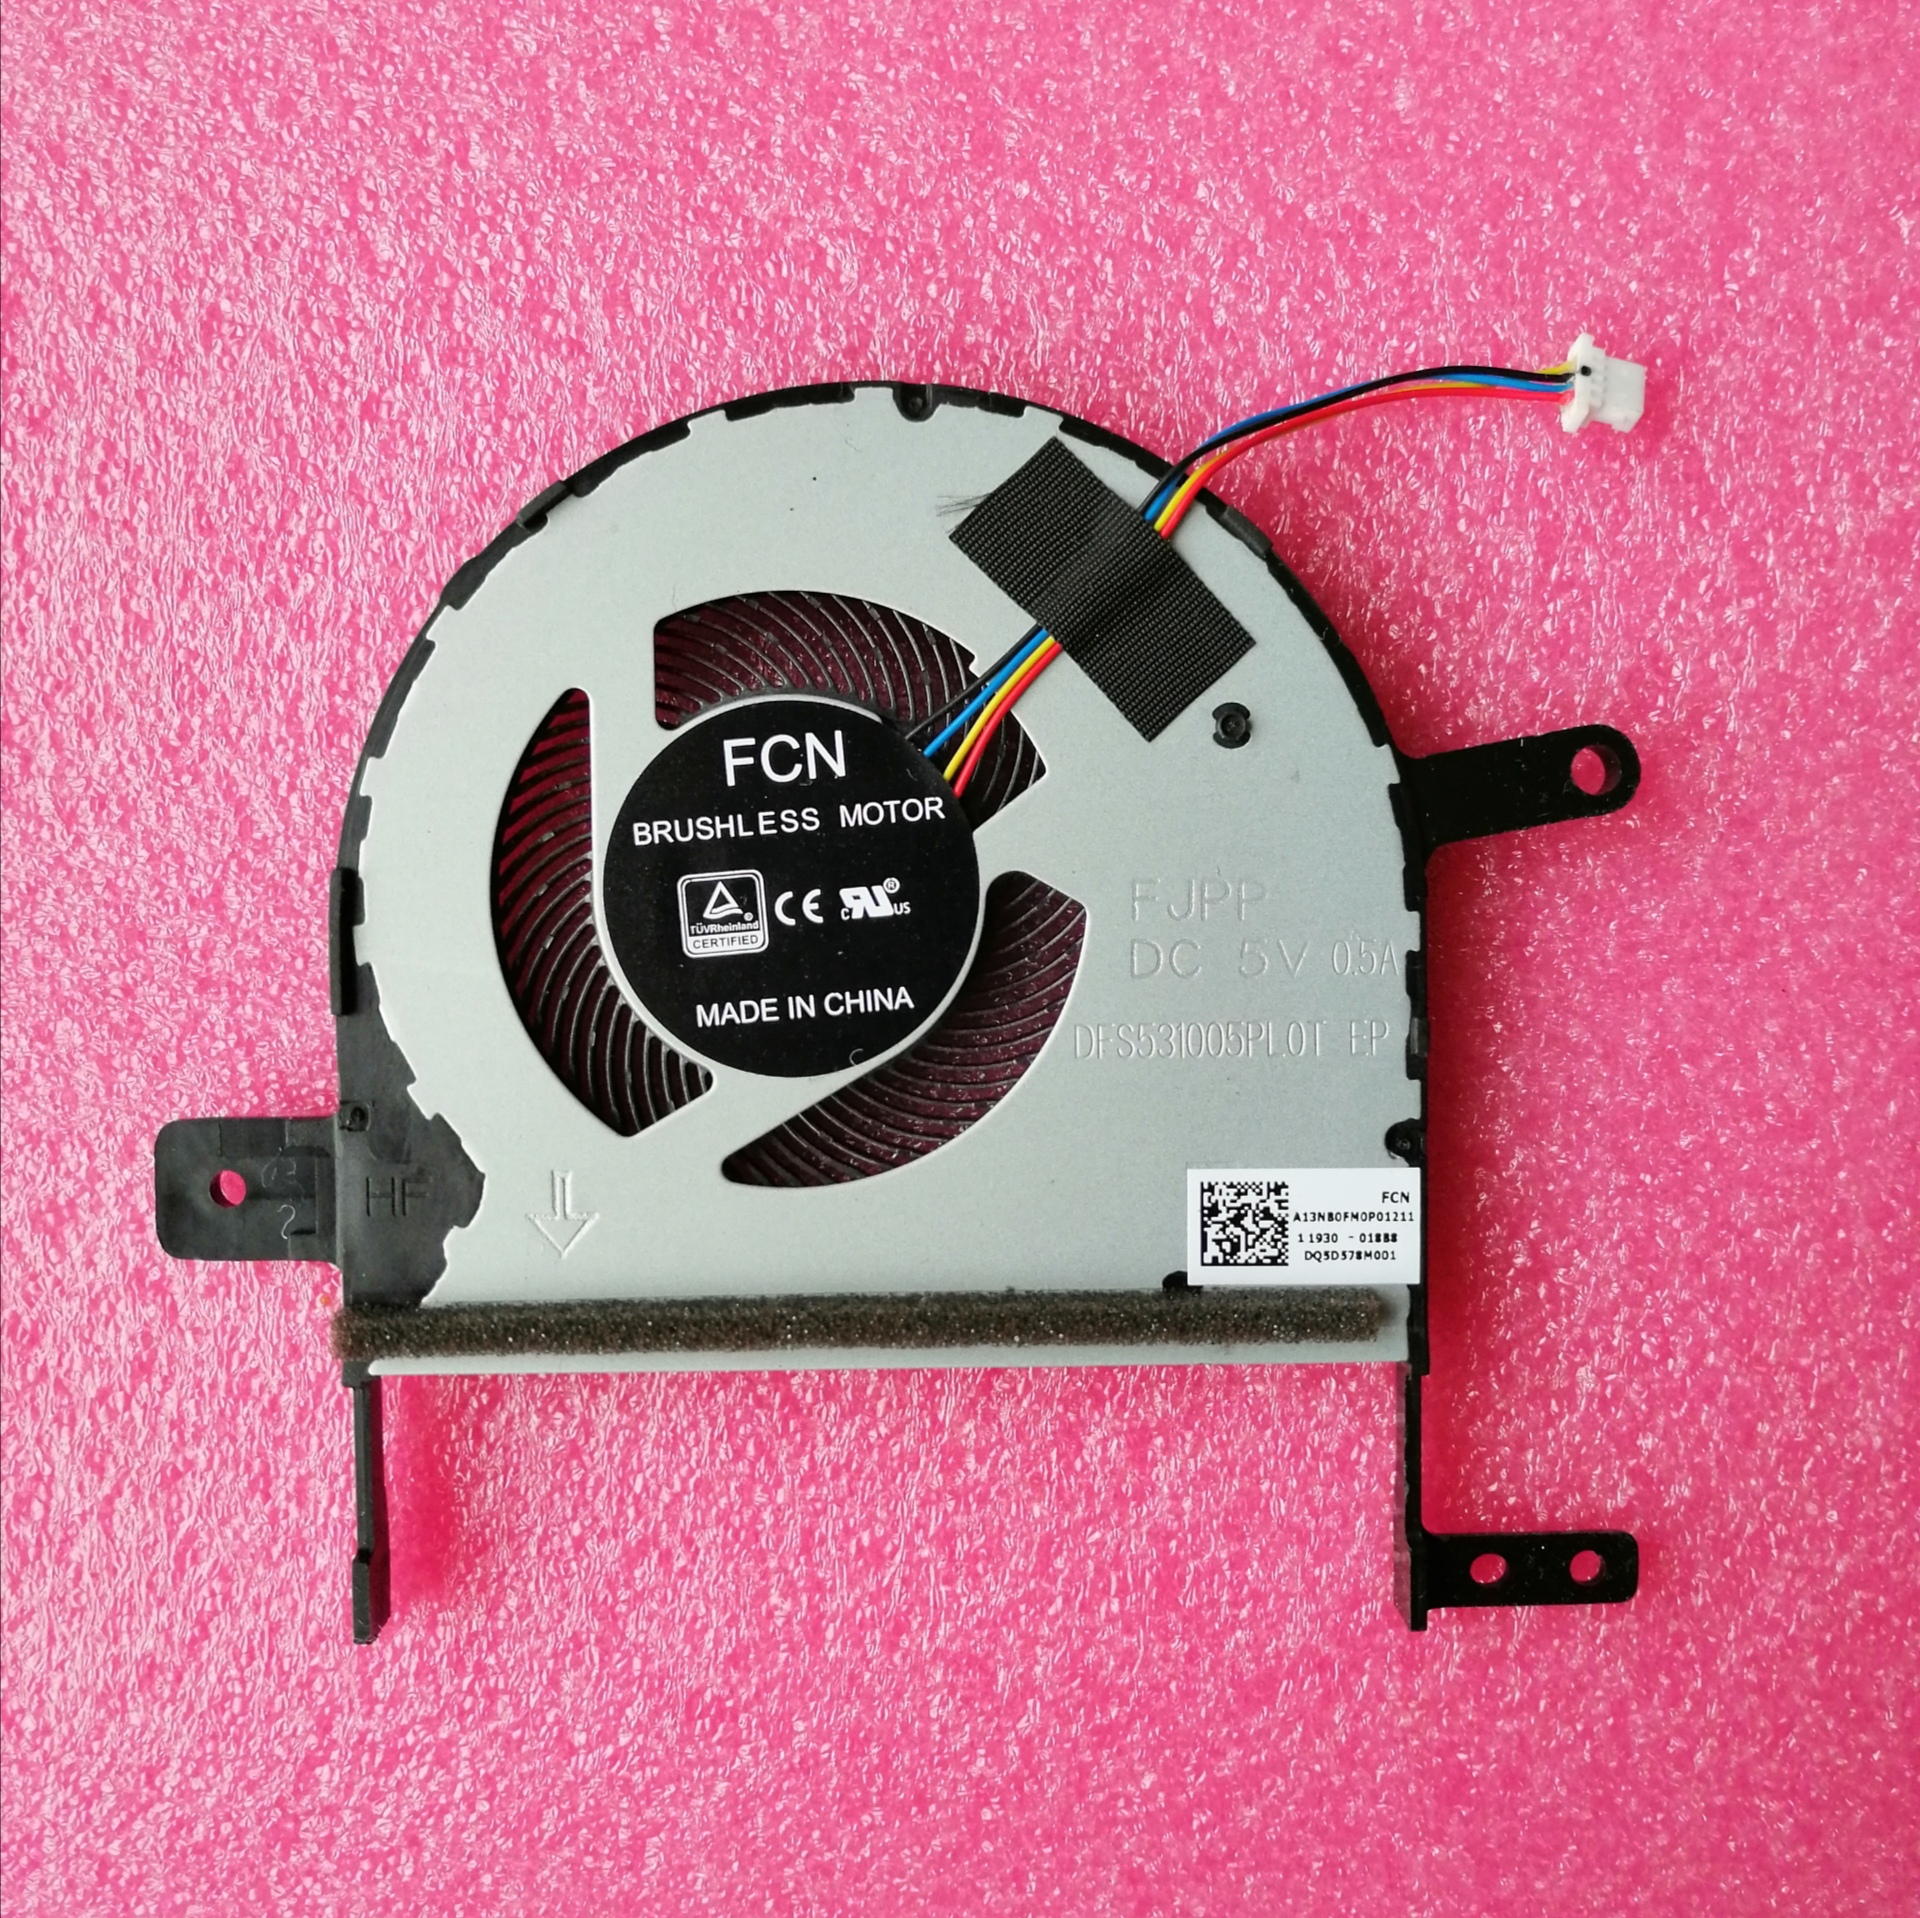 New CPU Cooler Fan For ASUS S501U X510U S510 X510 X510UN X510UQ X510UR X510UAR S510UQ S510UA F510U DFS531005PL0T FJPP Radiator